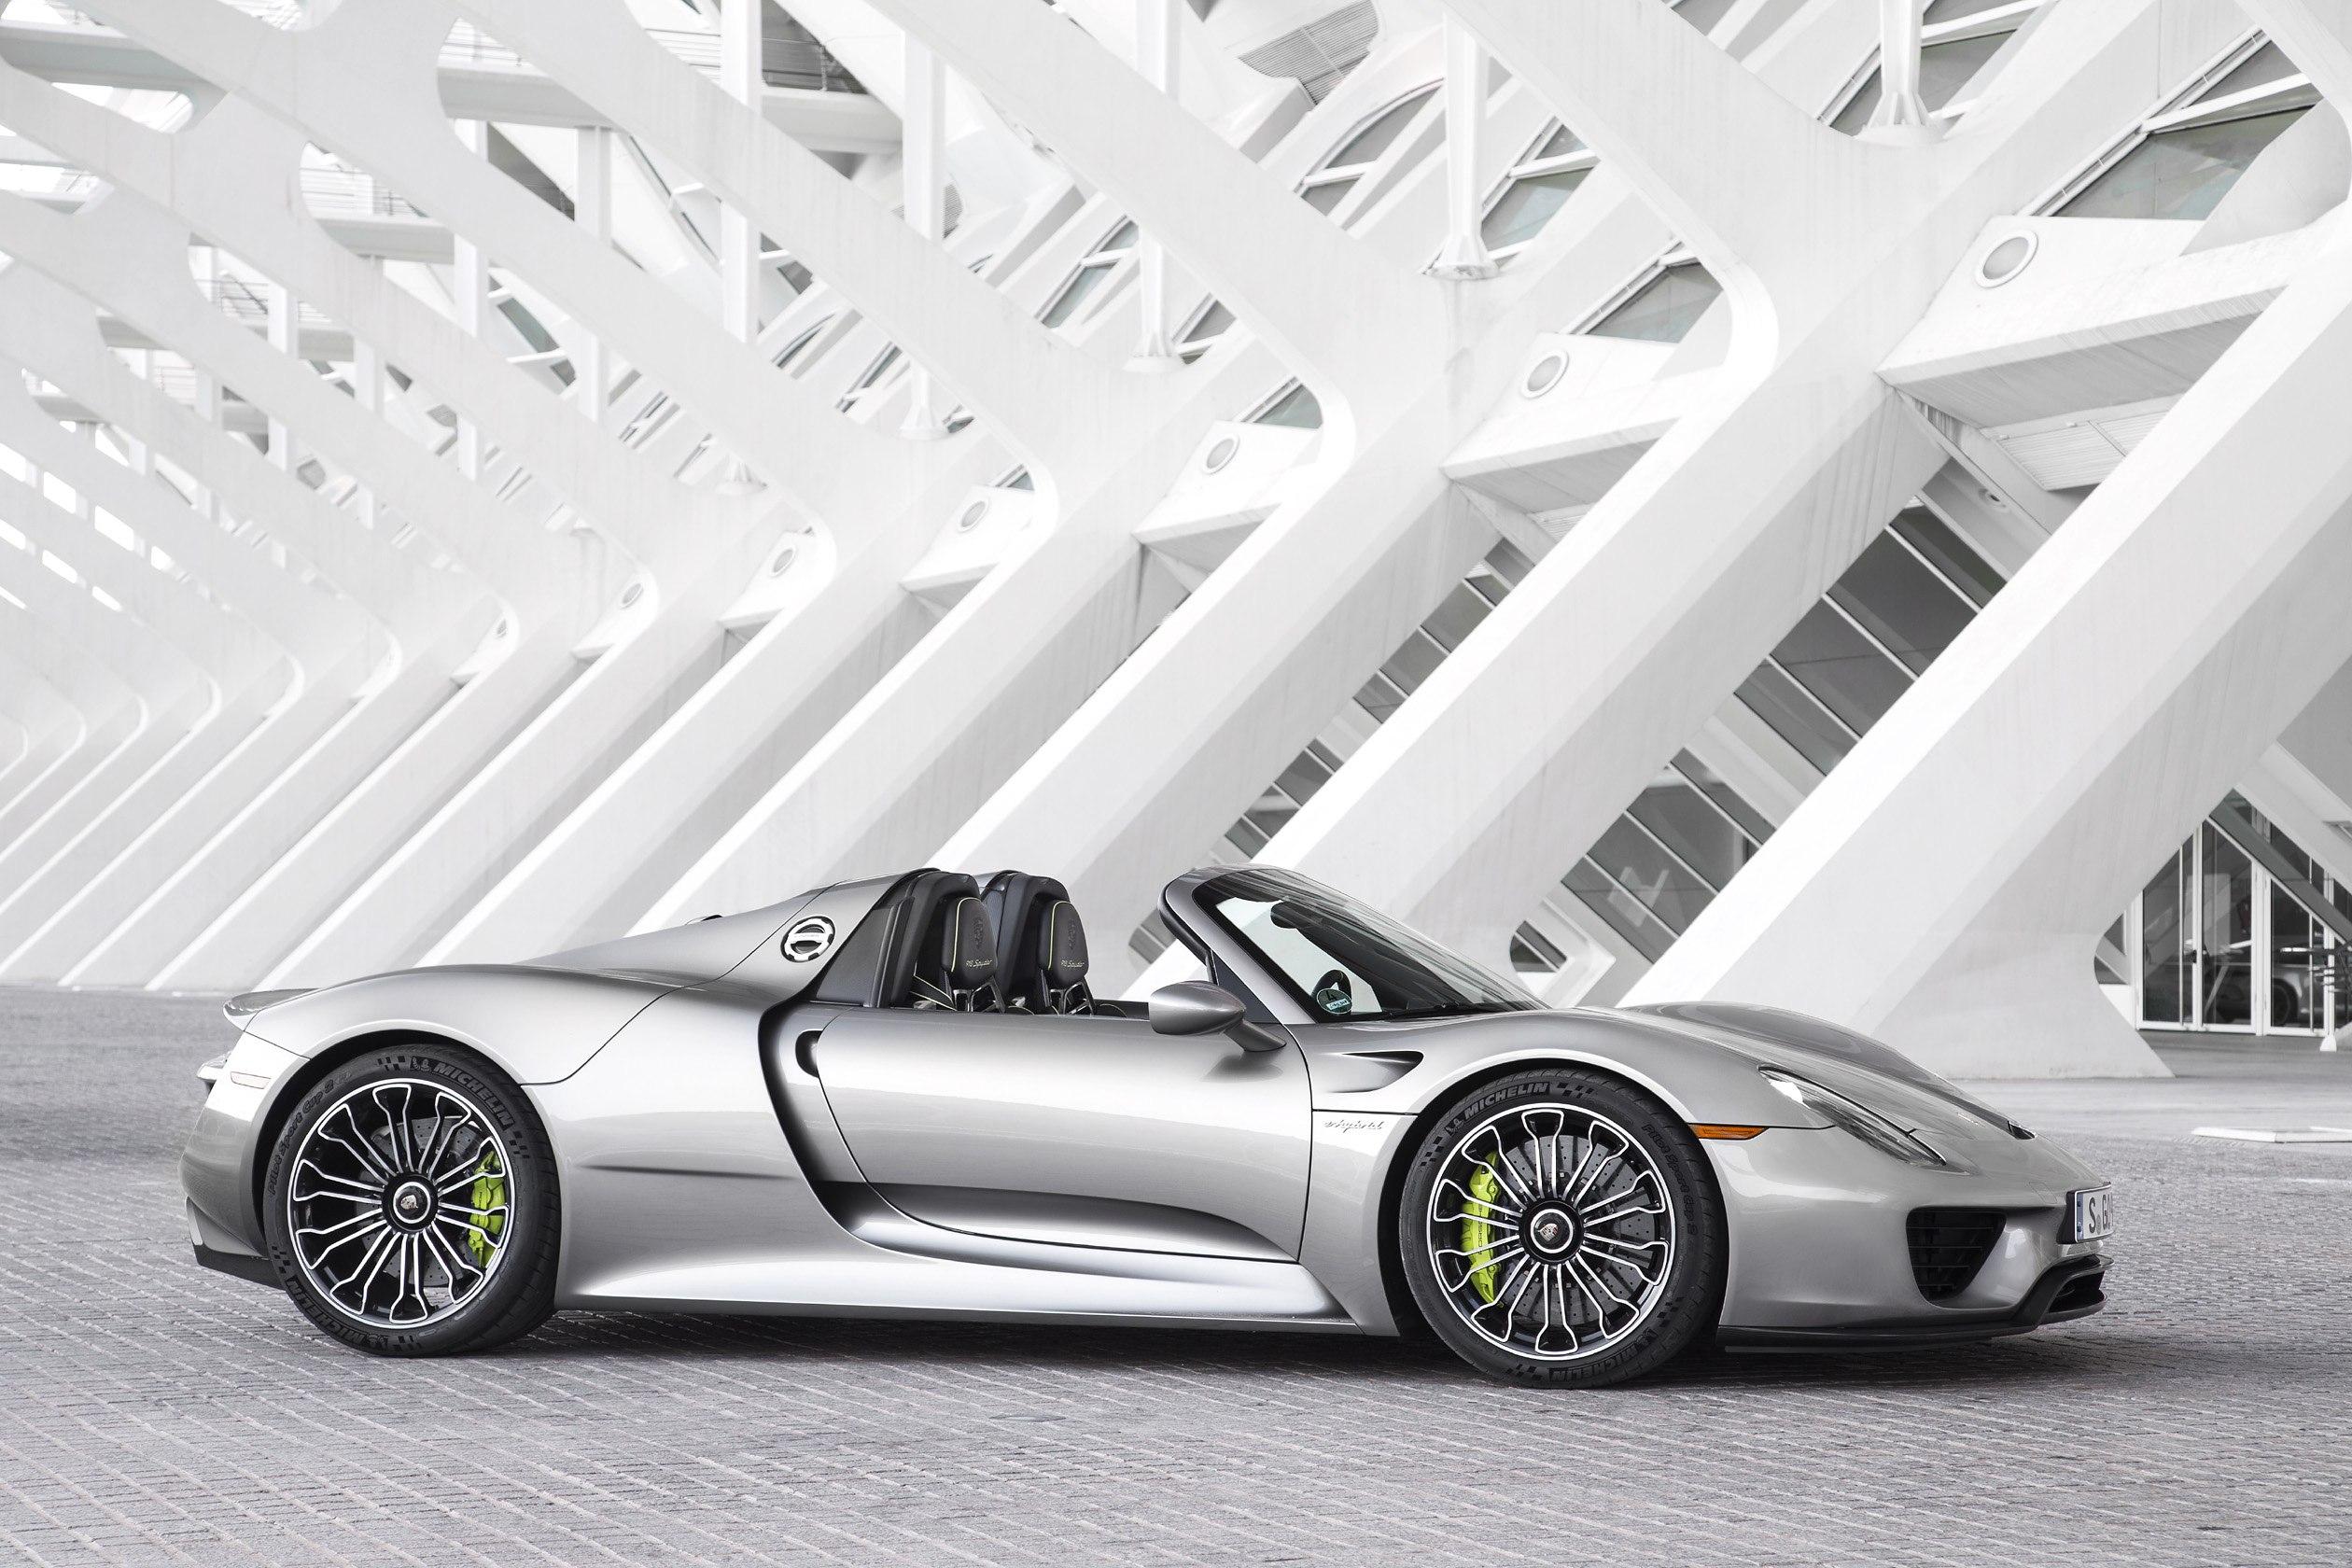 P14_0108_a5_rgb Surprising Porsche 918 Spyder Brochure Pdf Cars Trend